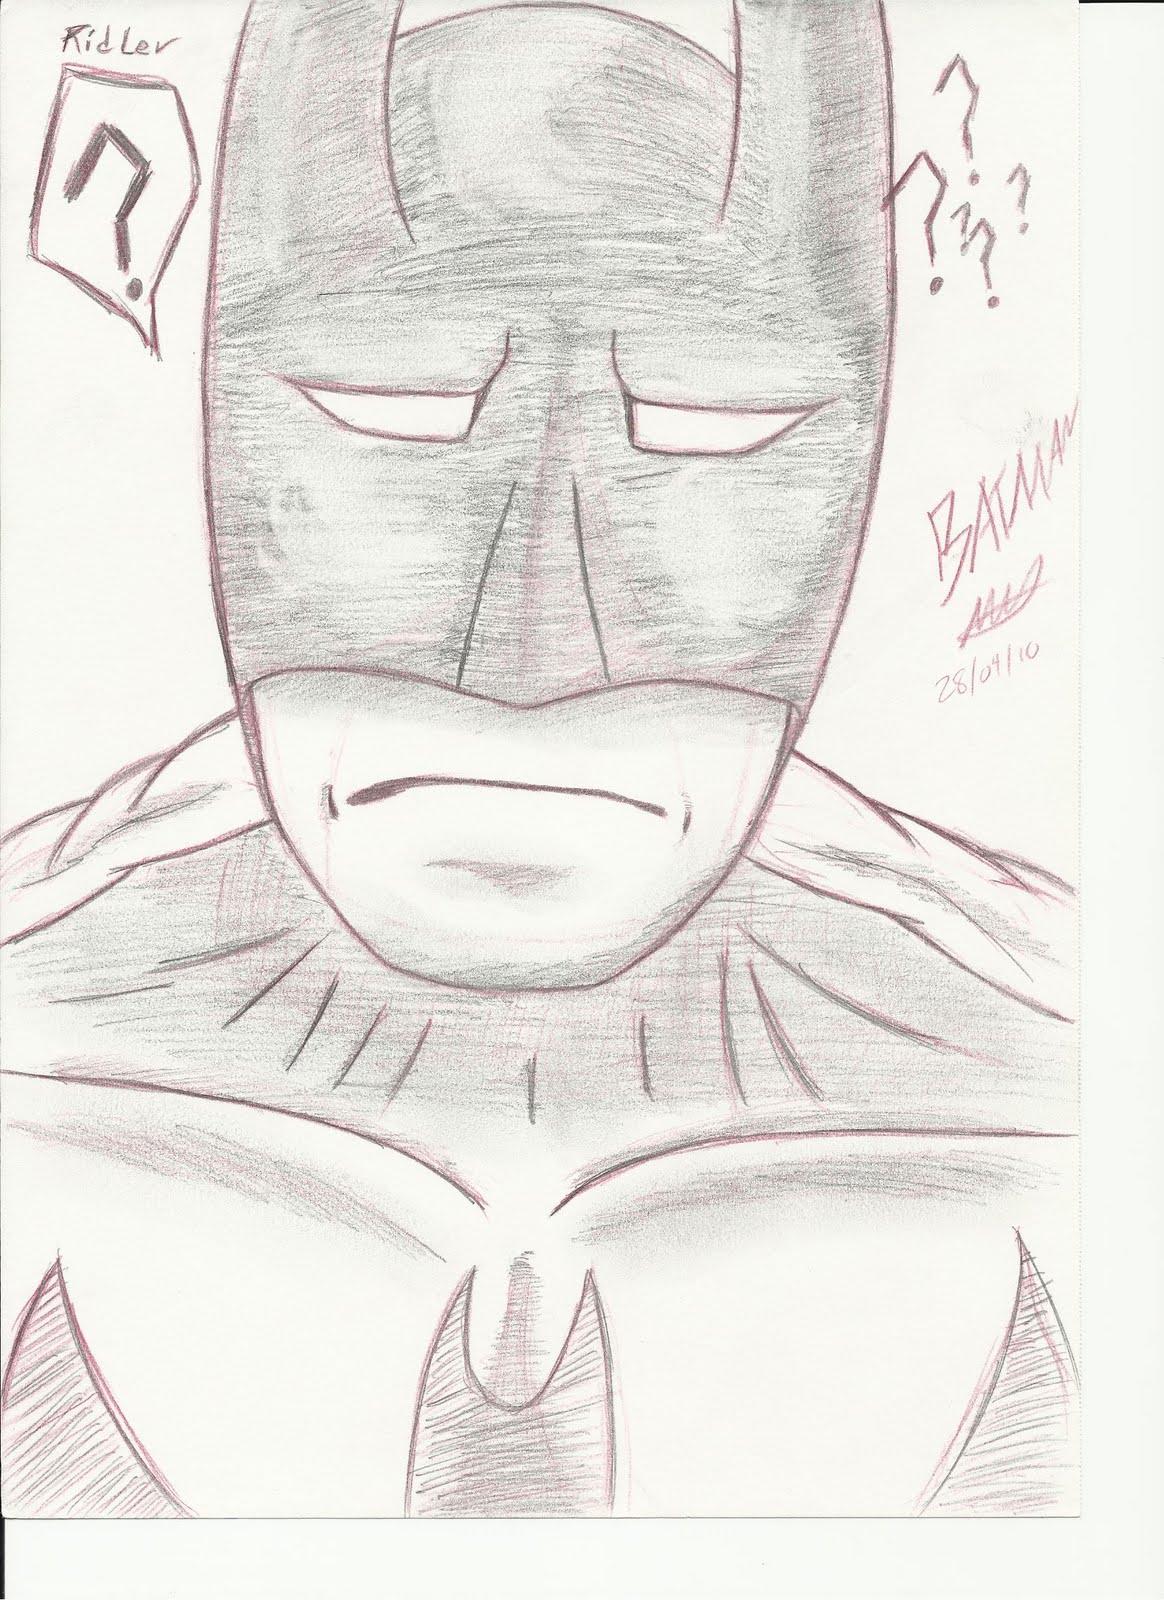 http://2.bp.blogspot.com/-RWDIA_c8eIU/TkboL9JKK-I/AAAAAAAAAfo/0QOK_-mvXyM/s1600/Batman.....the+ridler.....jpg